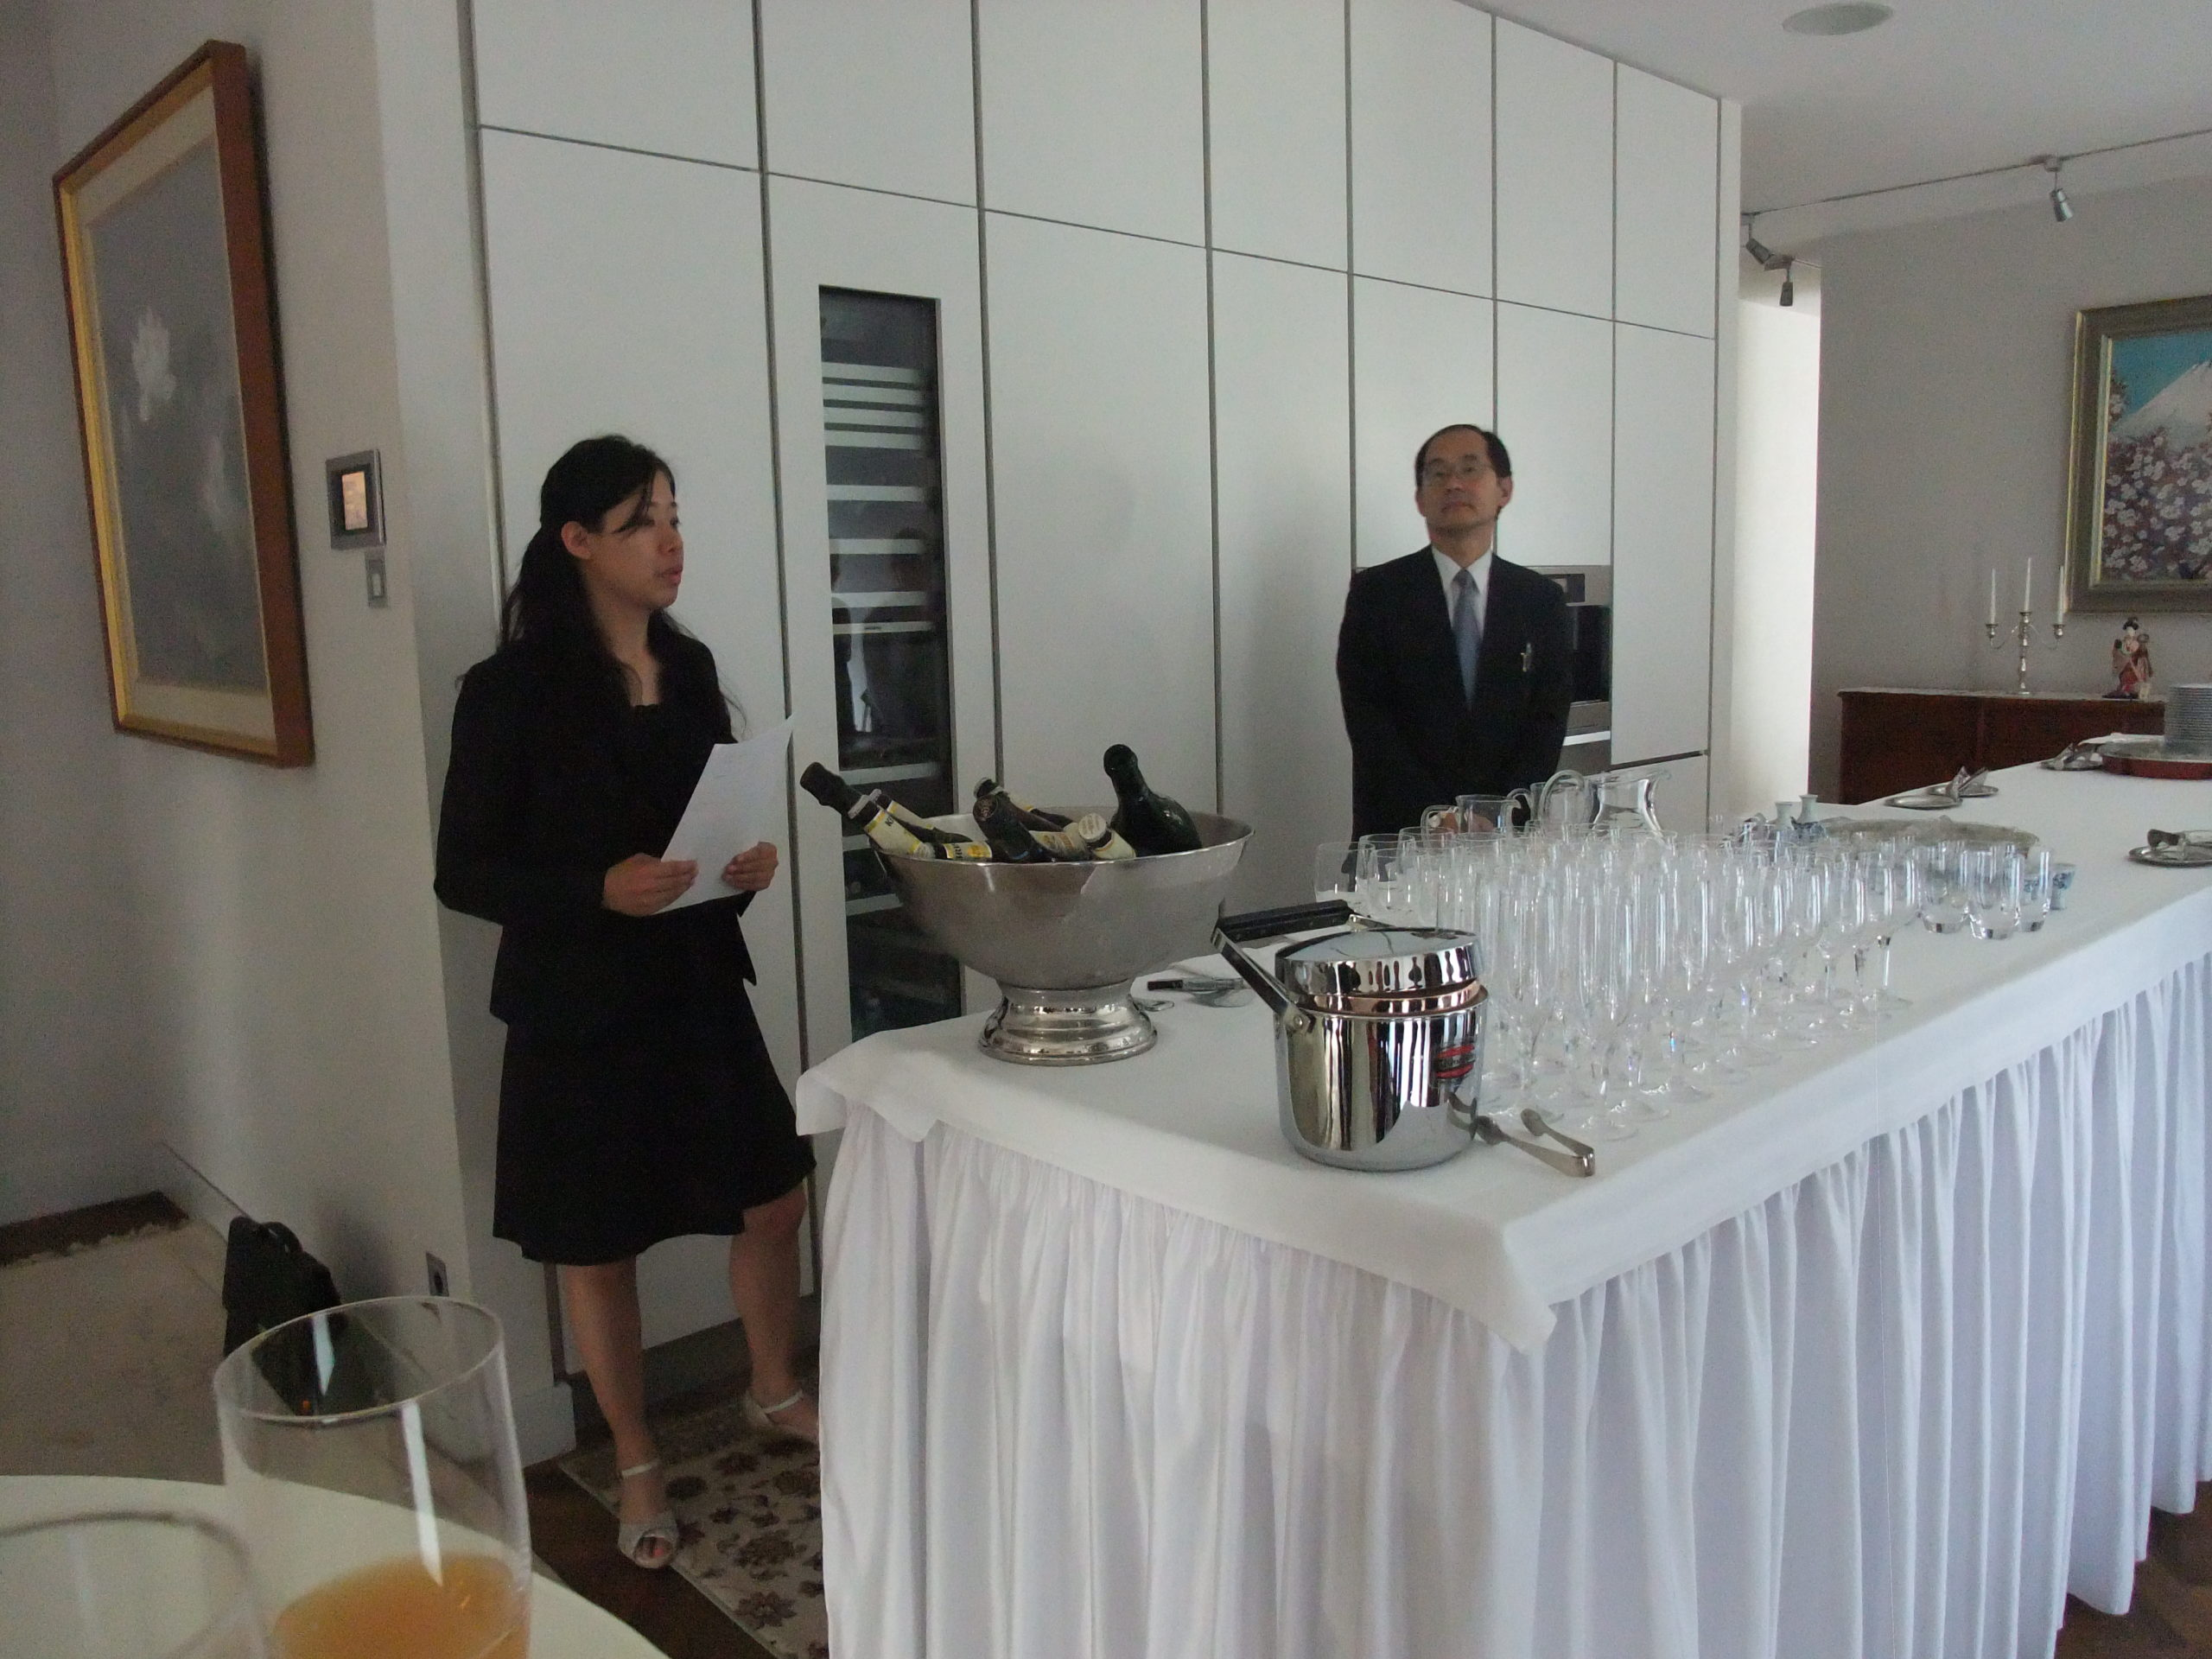 Empfang des japanischen Generalkonsuls 2014